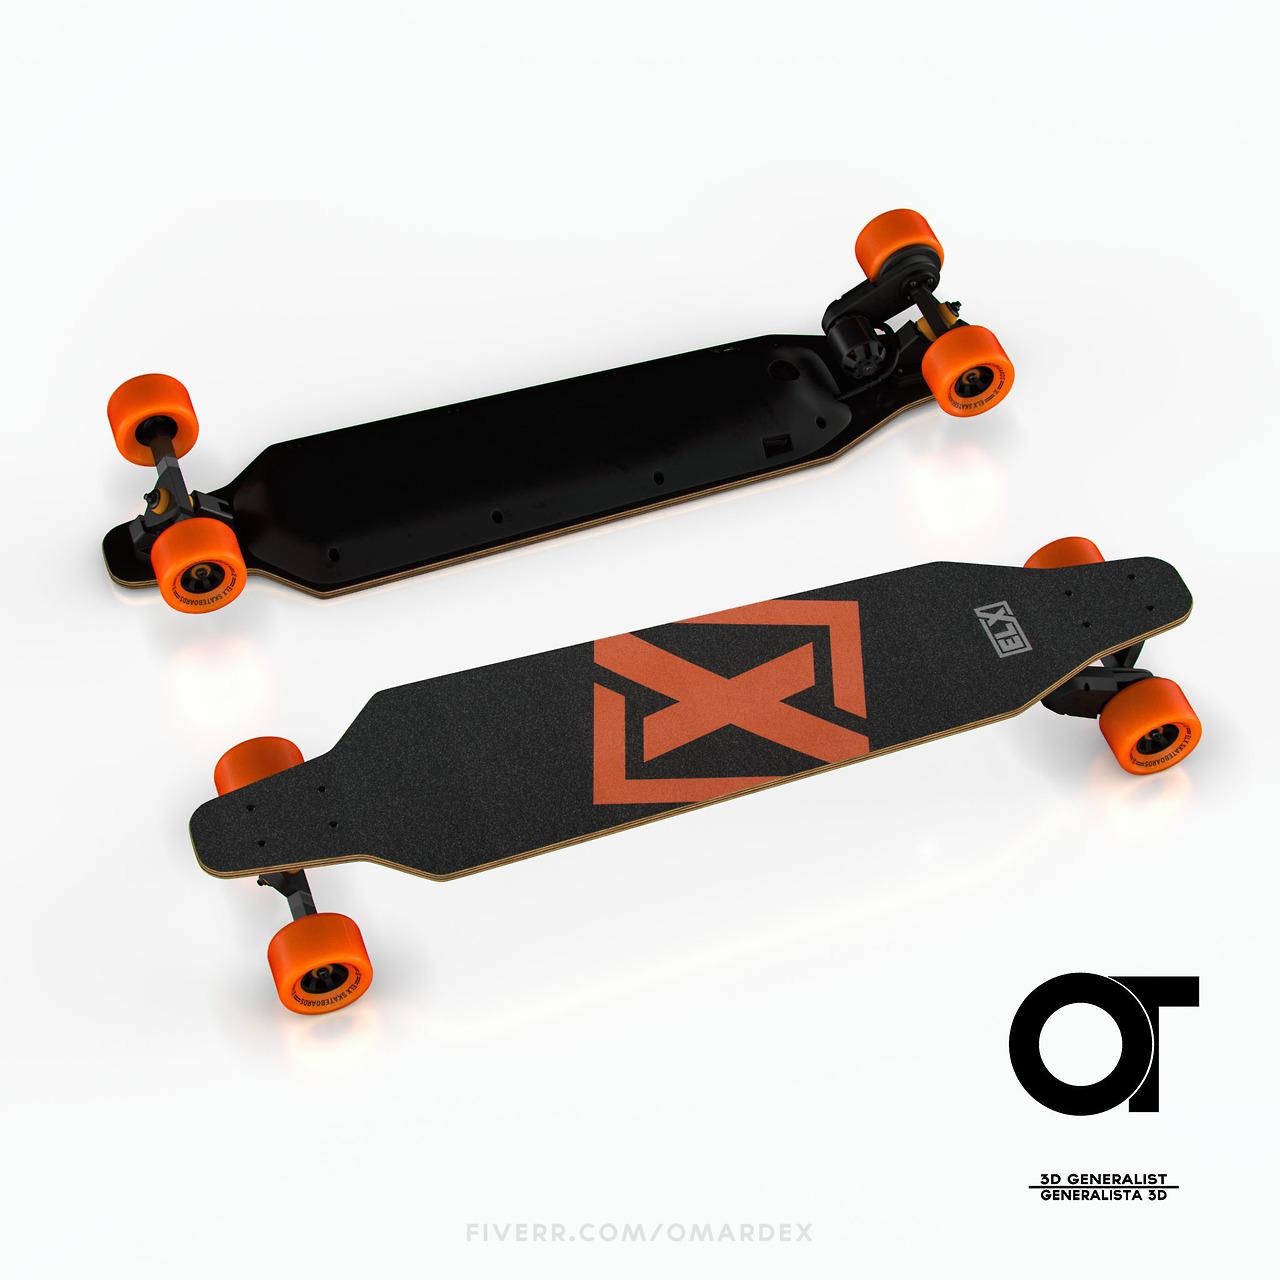 Omardex 3D \u2014 ELX electric Skateboard